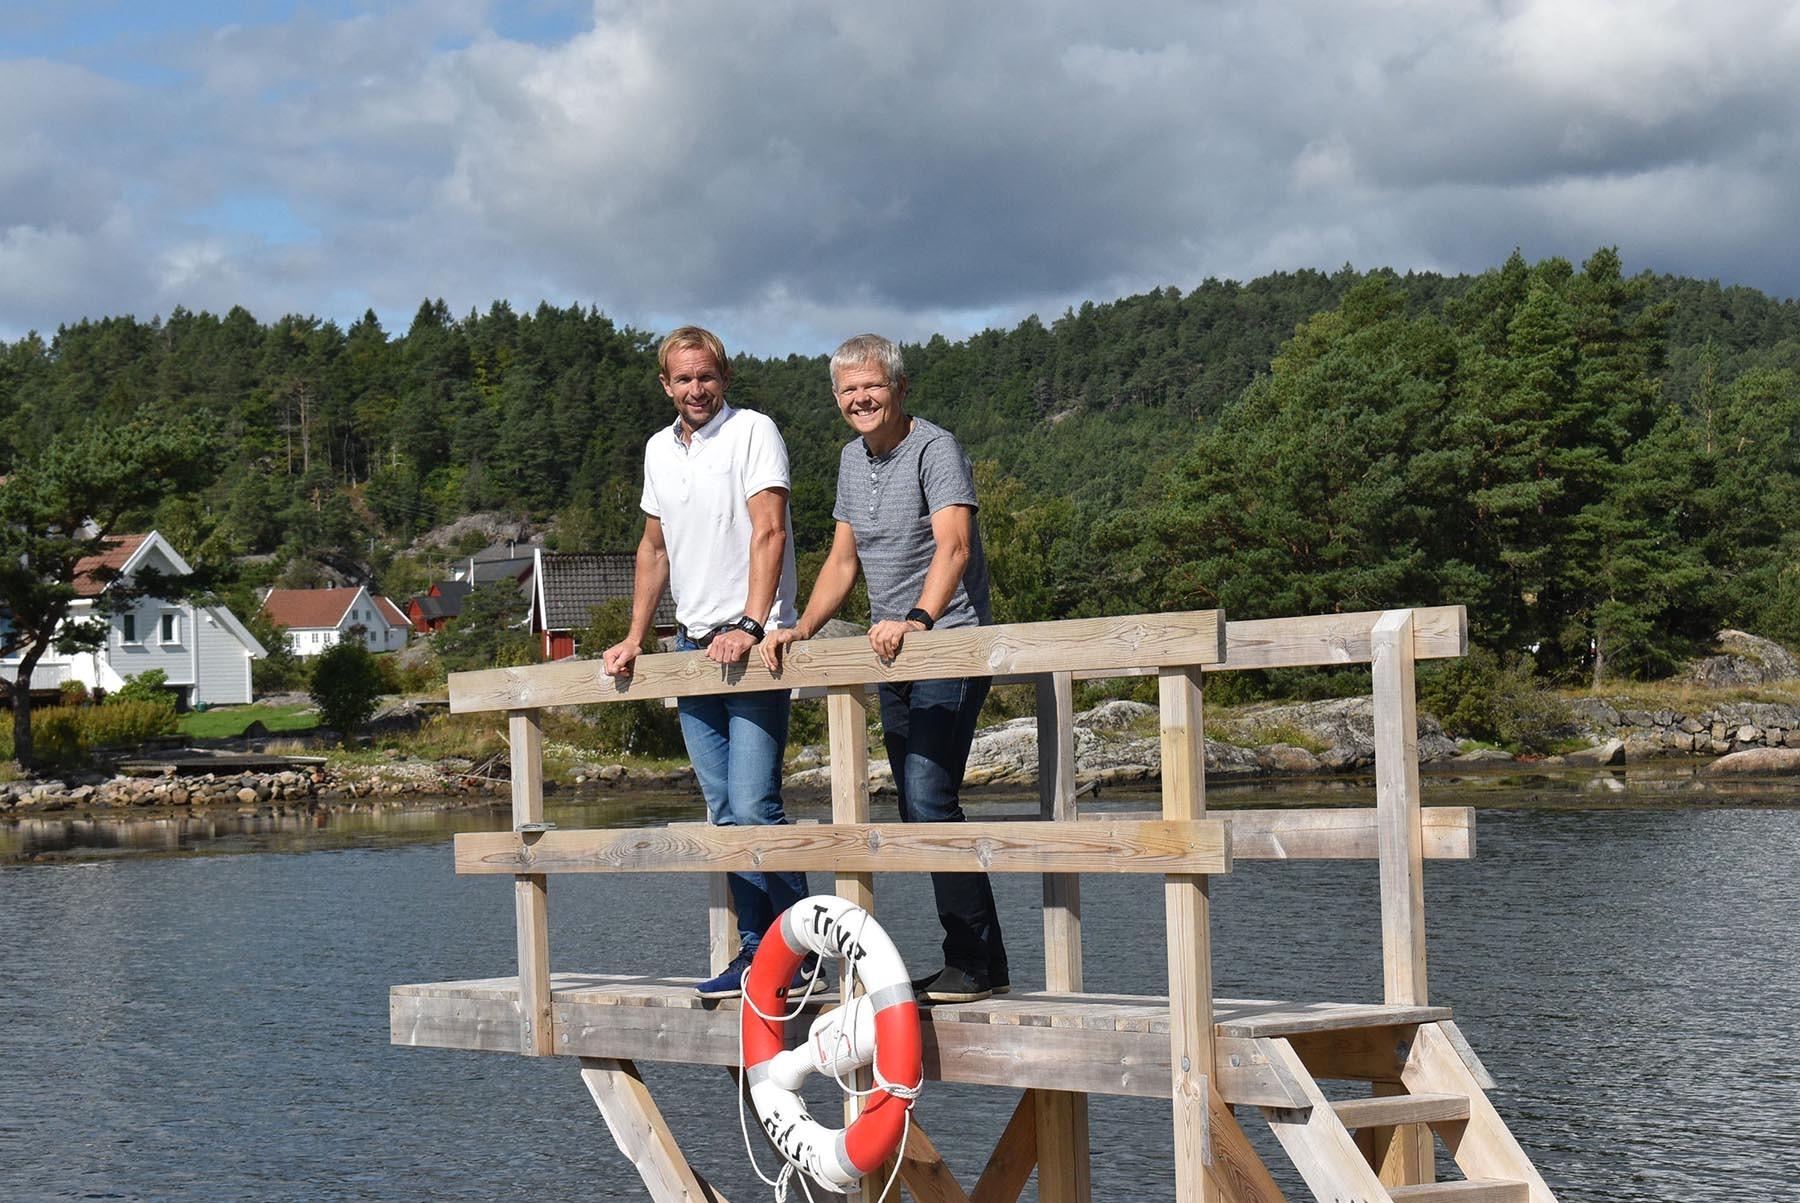 Bjørn og Ole Johan på stupetårnet.jpg